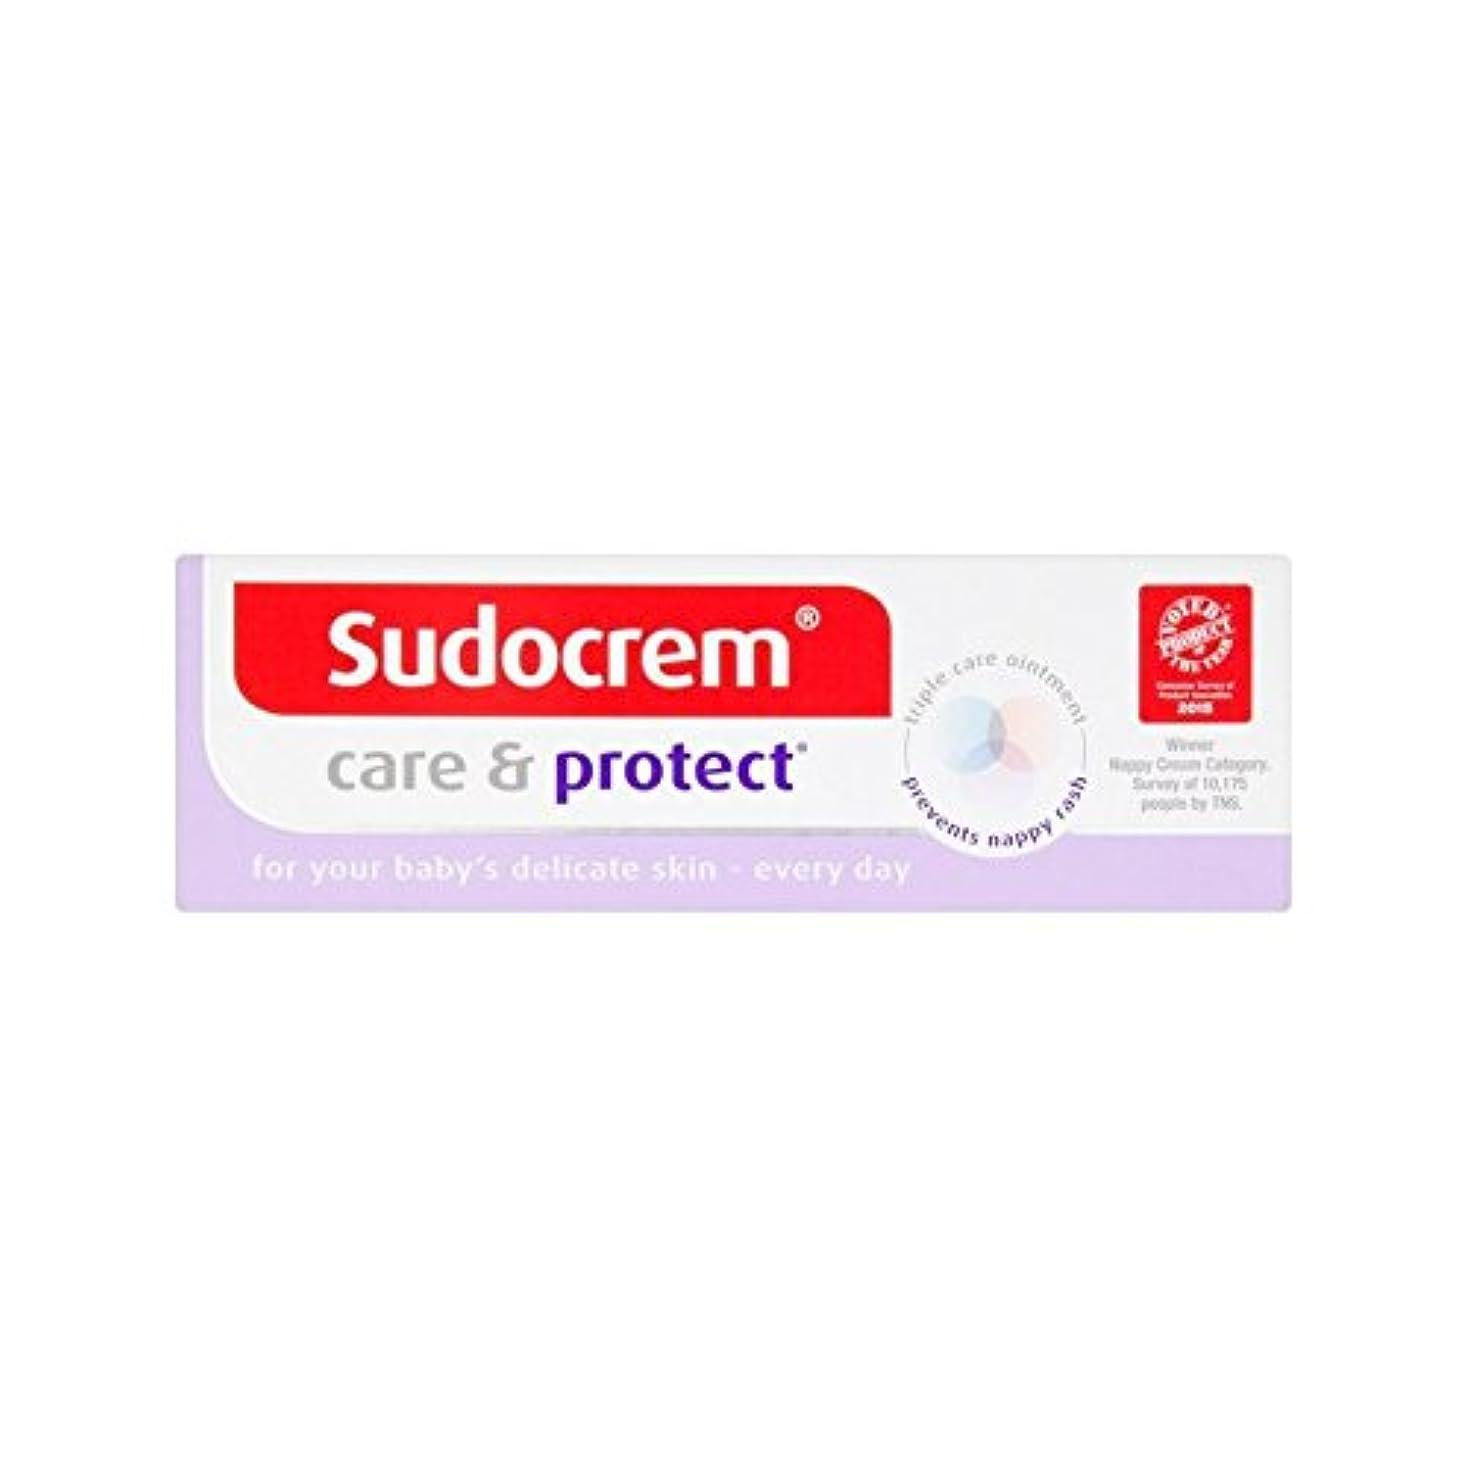 Sudocrem Care & Protect 30g (Pack of 4) - (Sudocrem) 30グラムケア&保護 (x4) [並行輸入品]